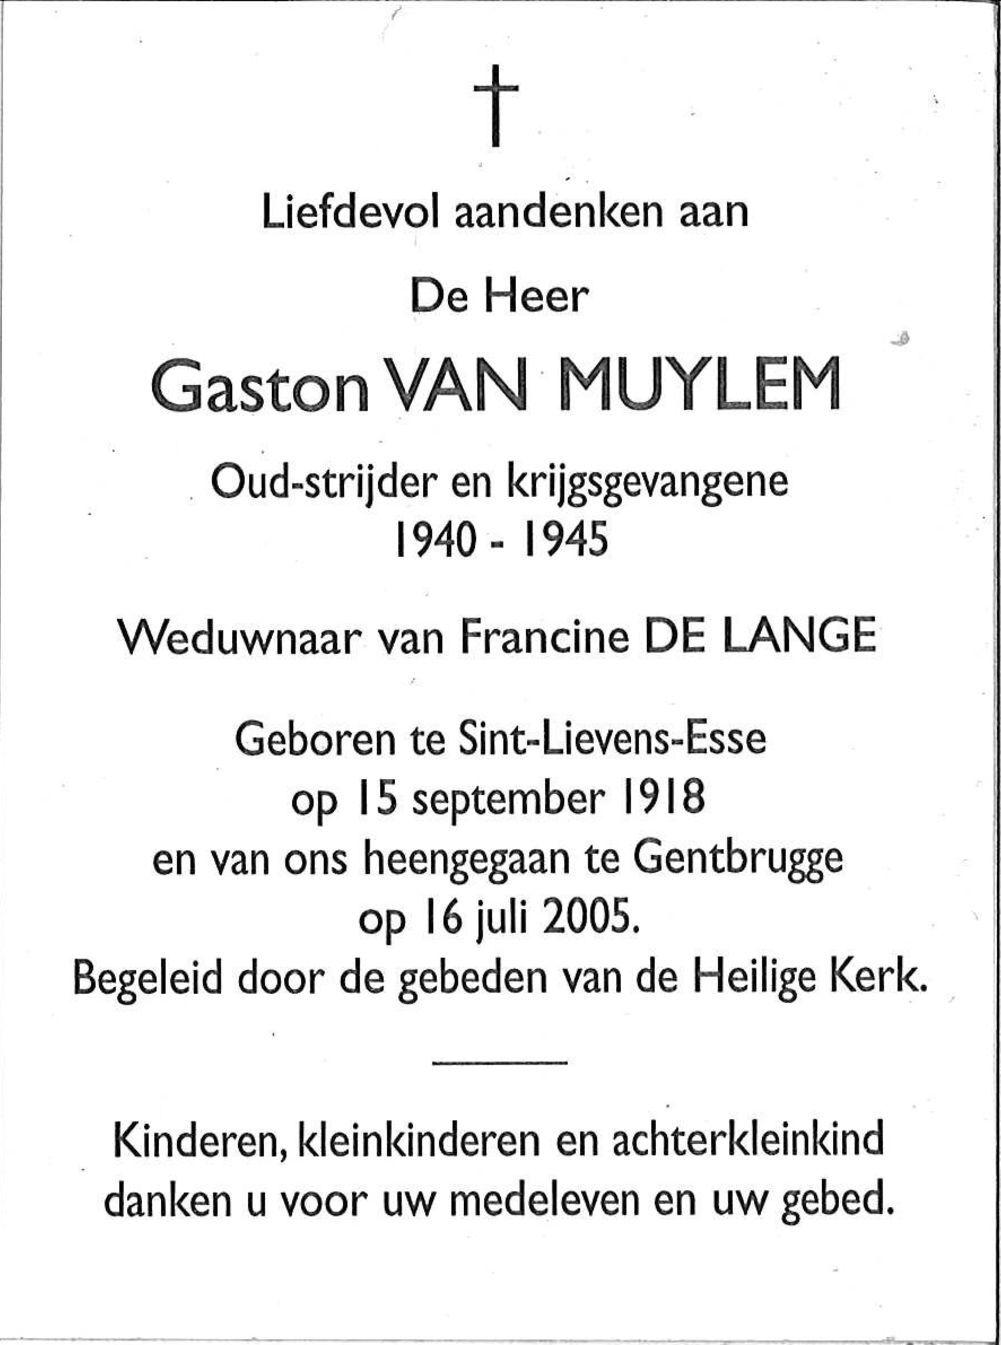 Van Muylem Gaston